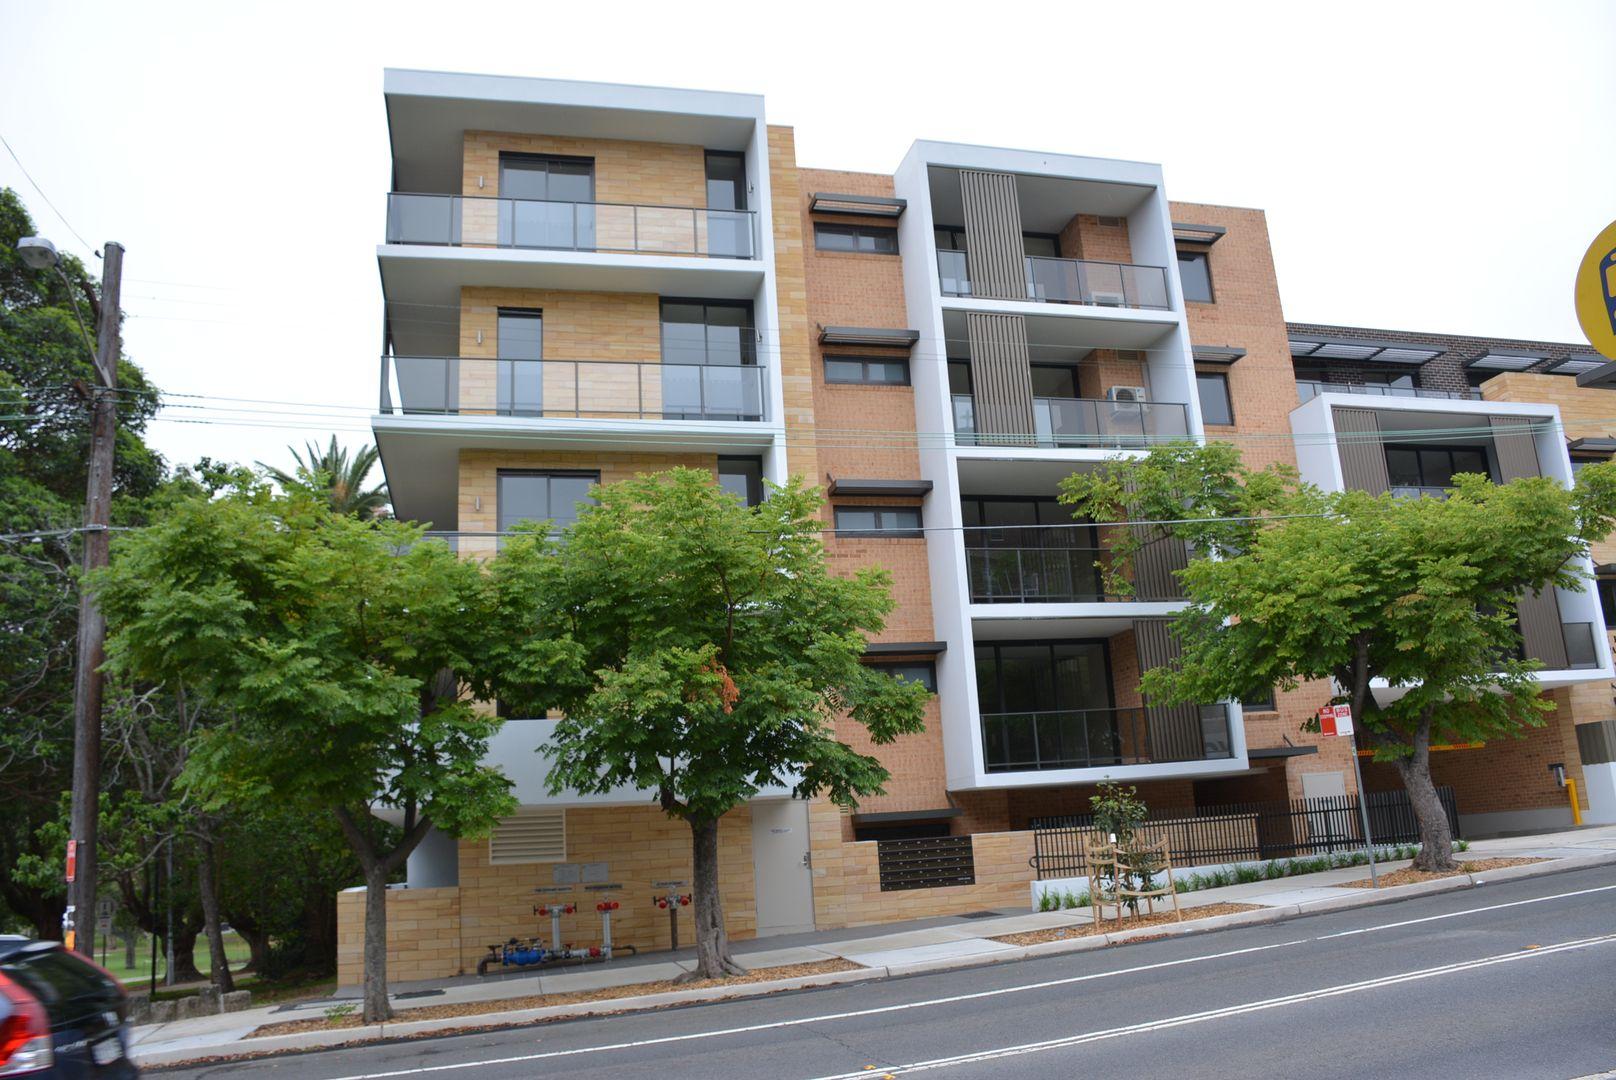 201/1-15 West  Street, Petersham NSW 2049, Image 0